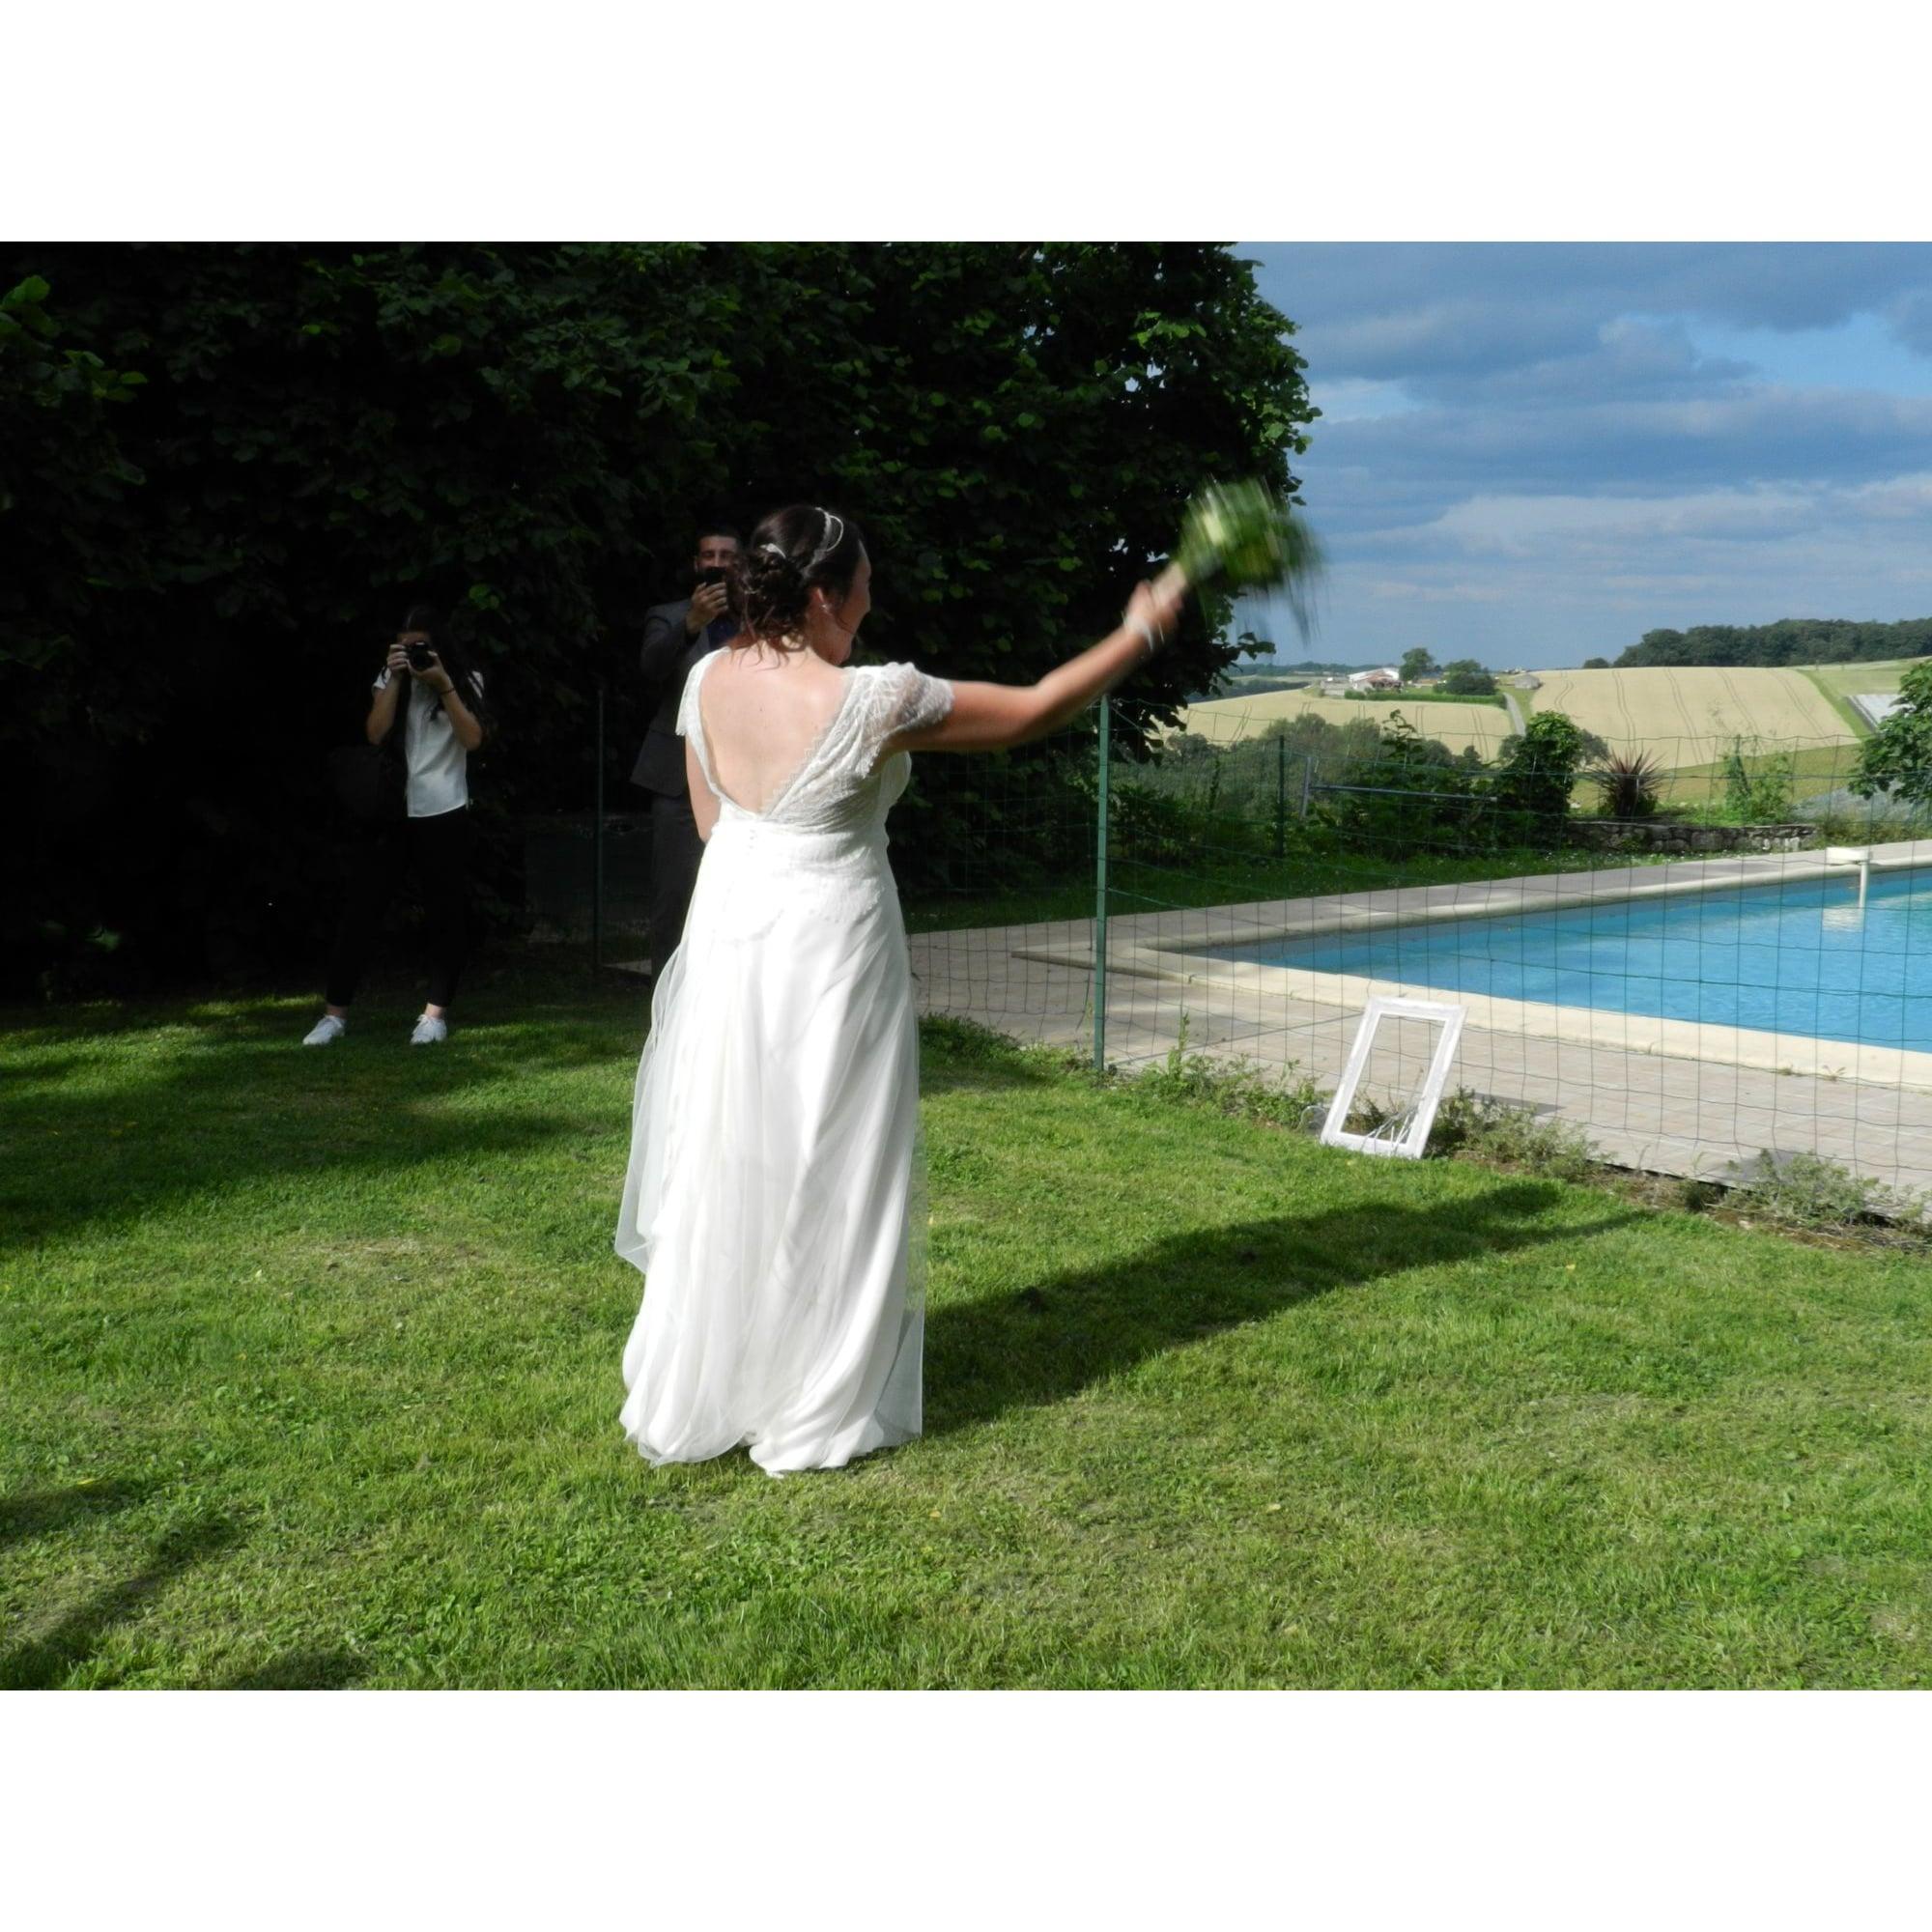 f76aef4484d2c Robe de mariée ELSA GARY 42 (L XL, T4) blanc - 8268024